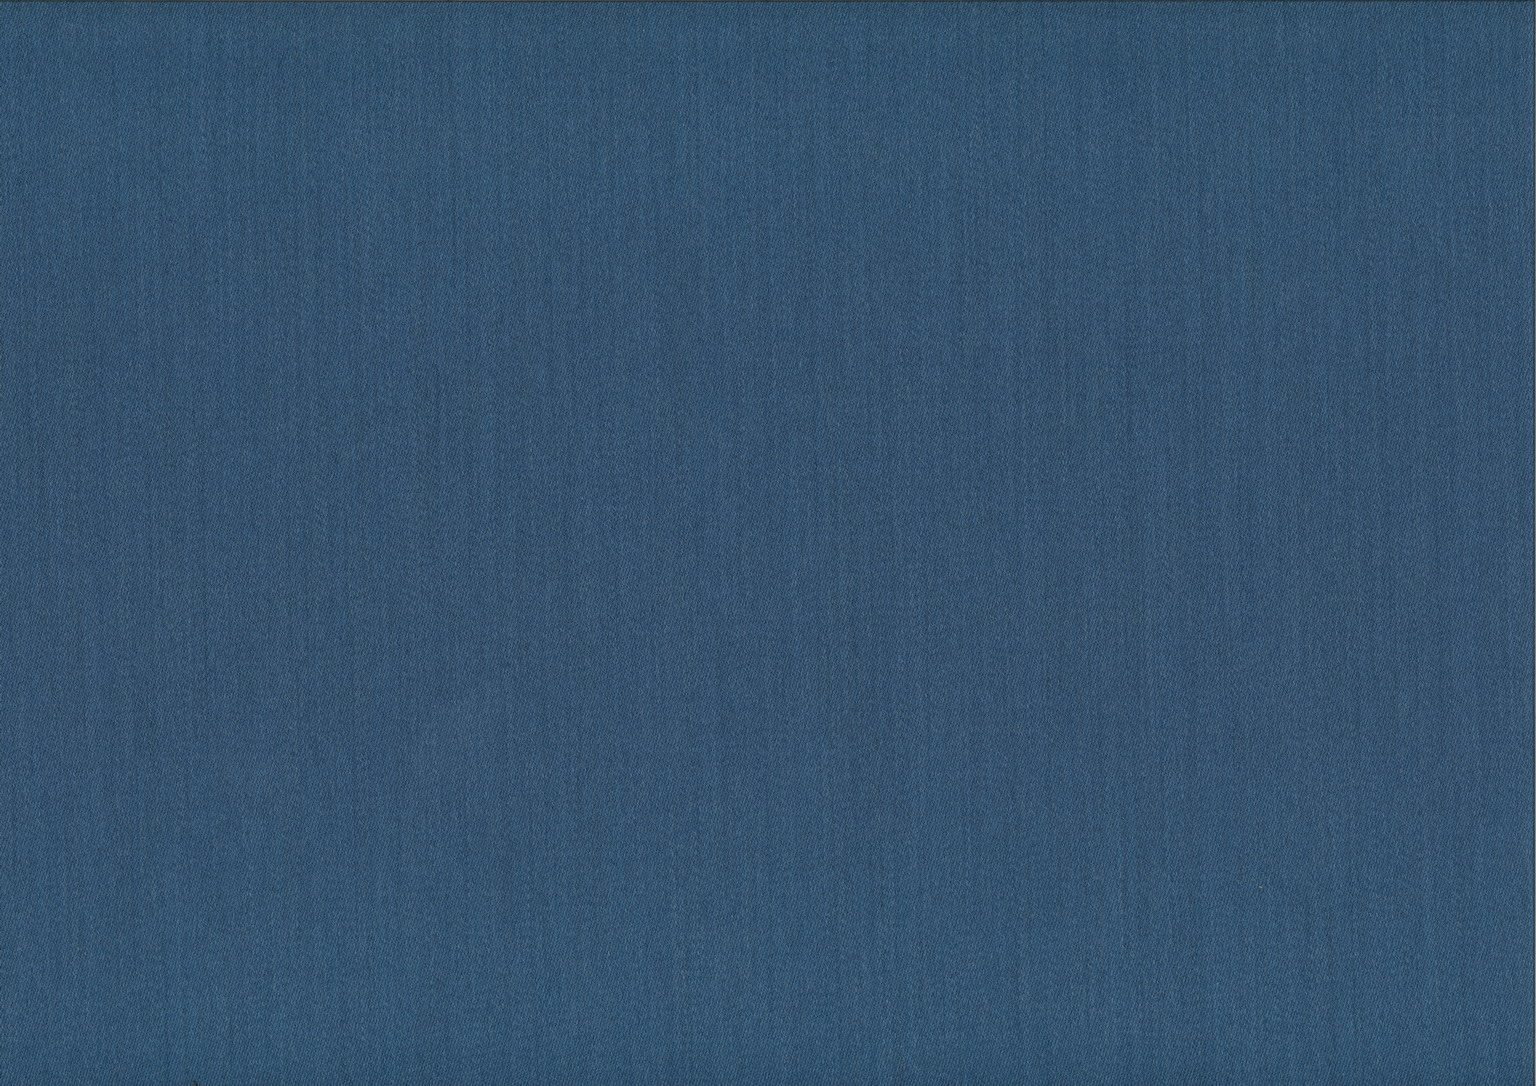 GSTAAD Light Blue